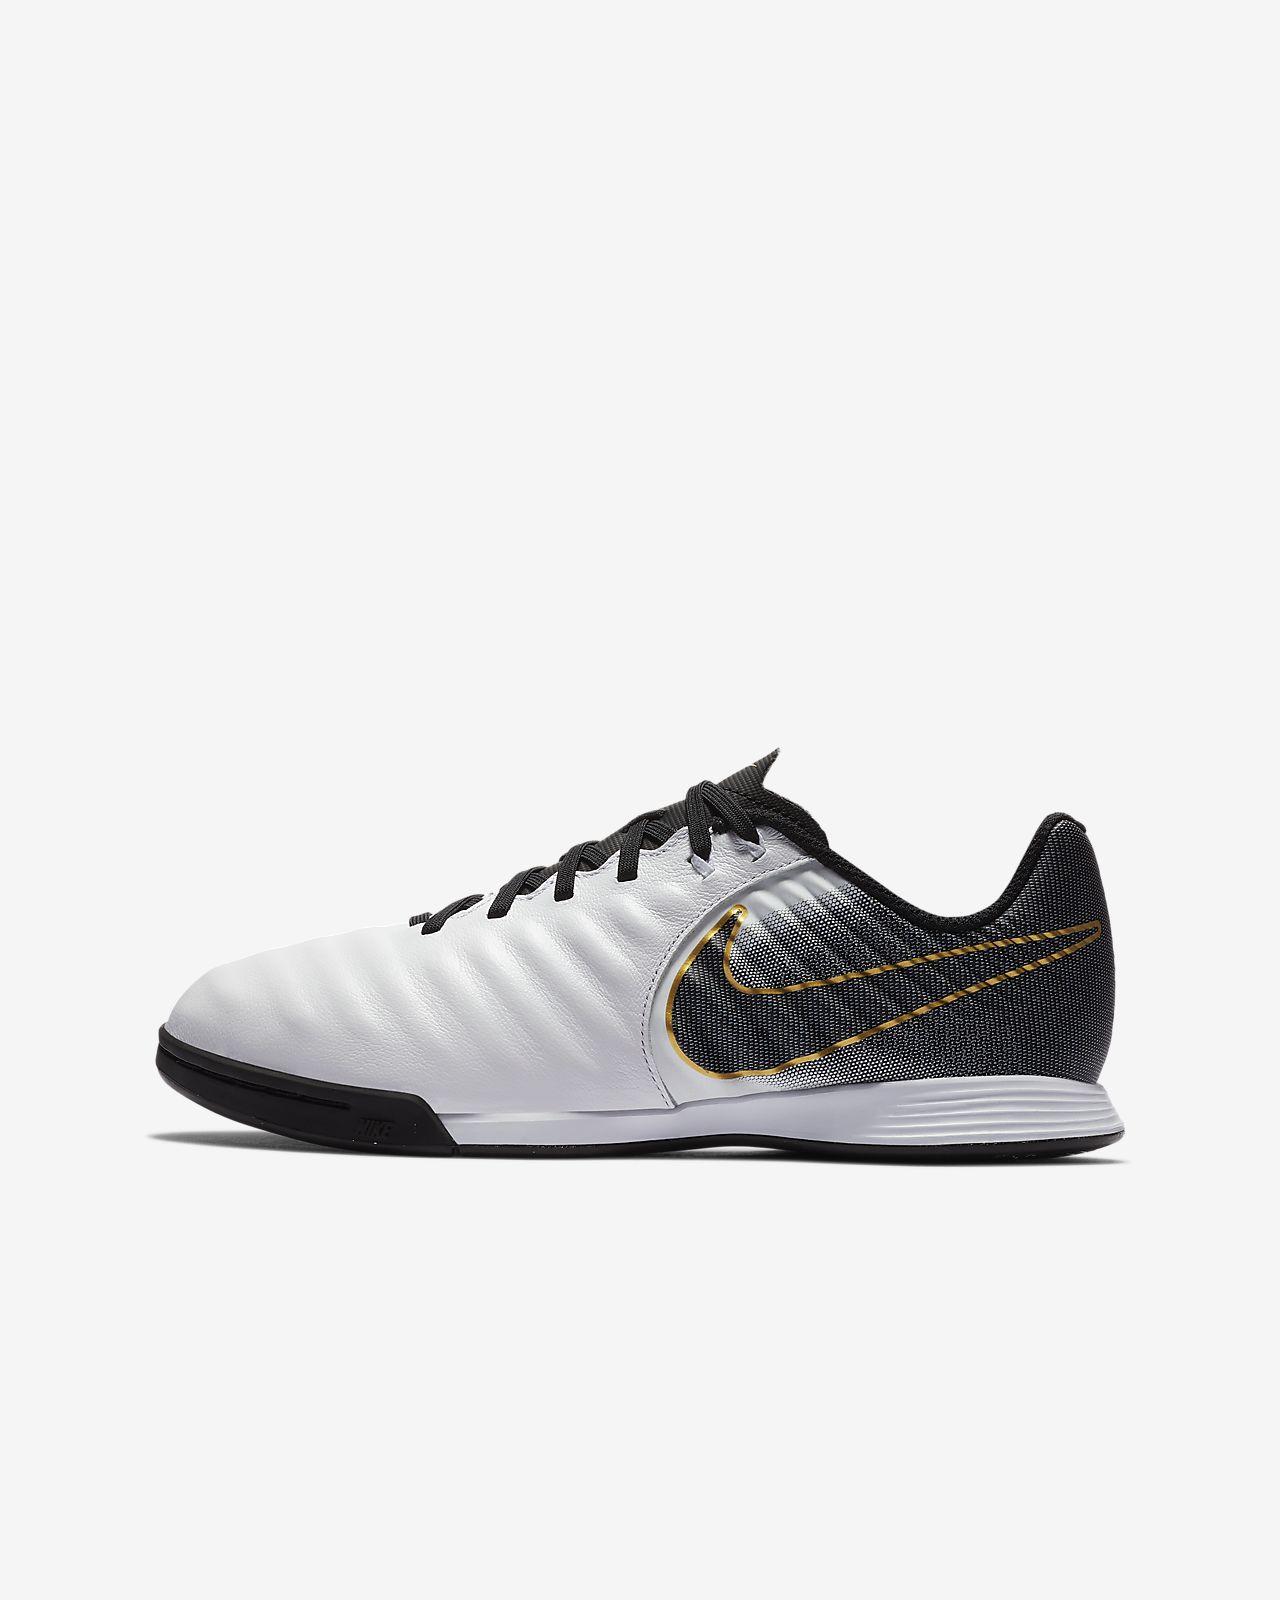 Crampons À Football Chaussure Legendx Nike De En Salle Jr Tiempo nUaqqO6T